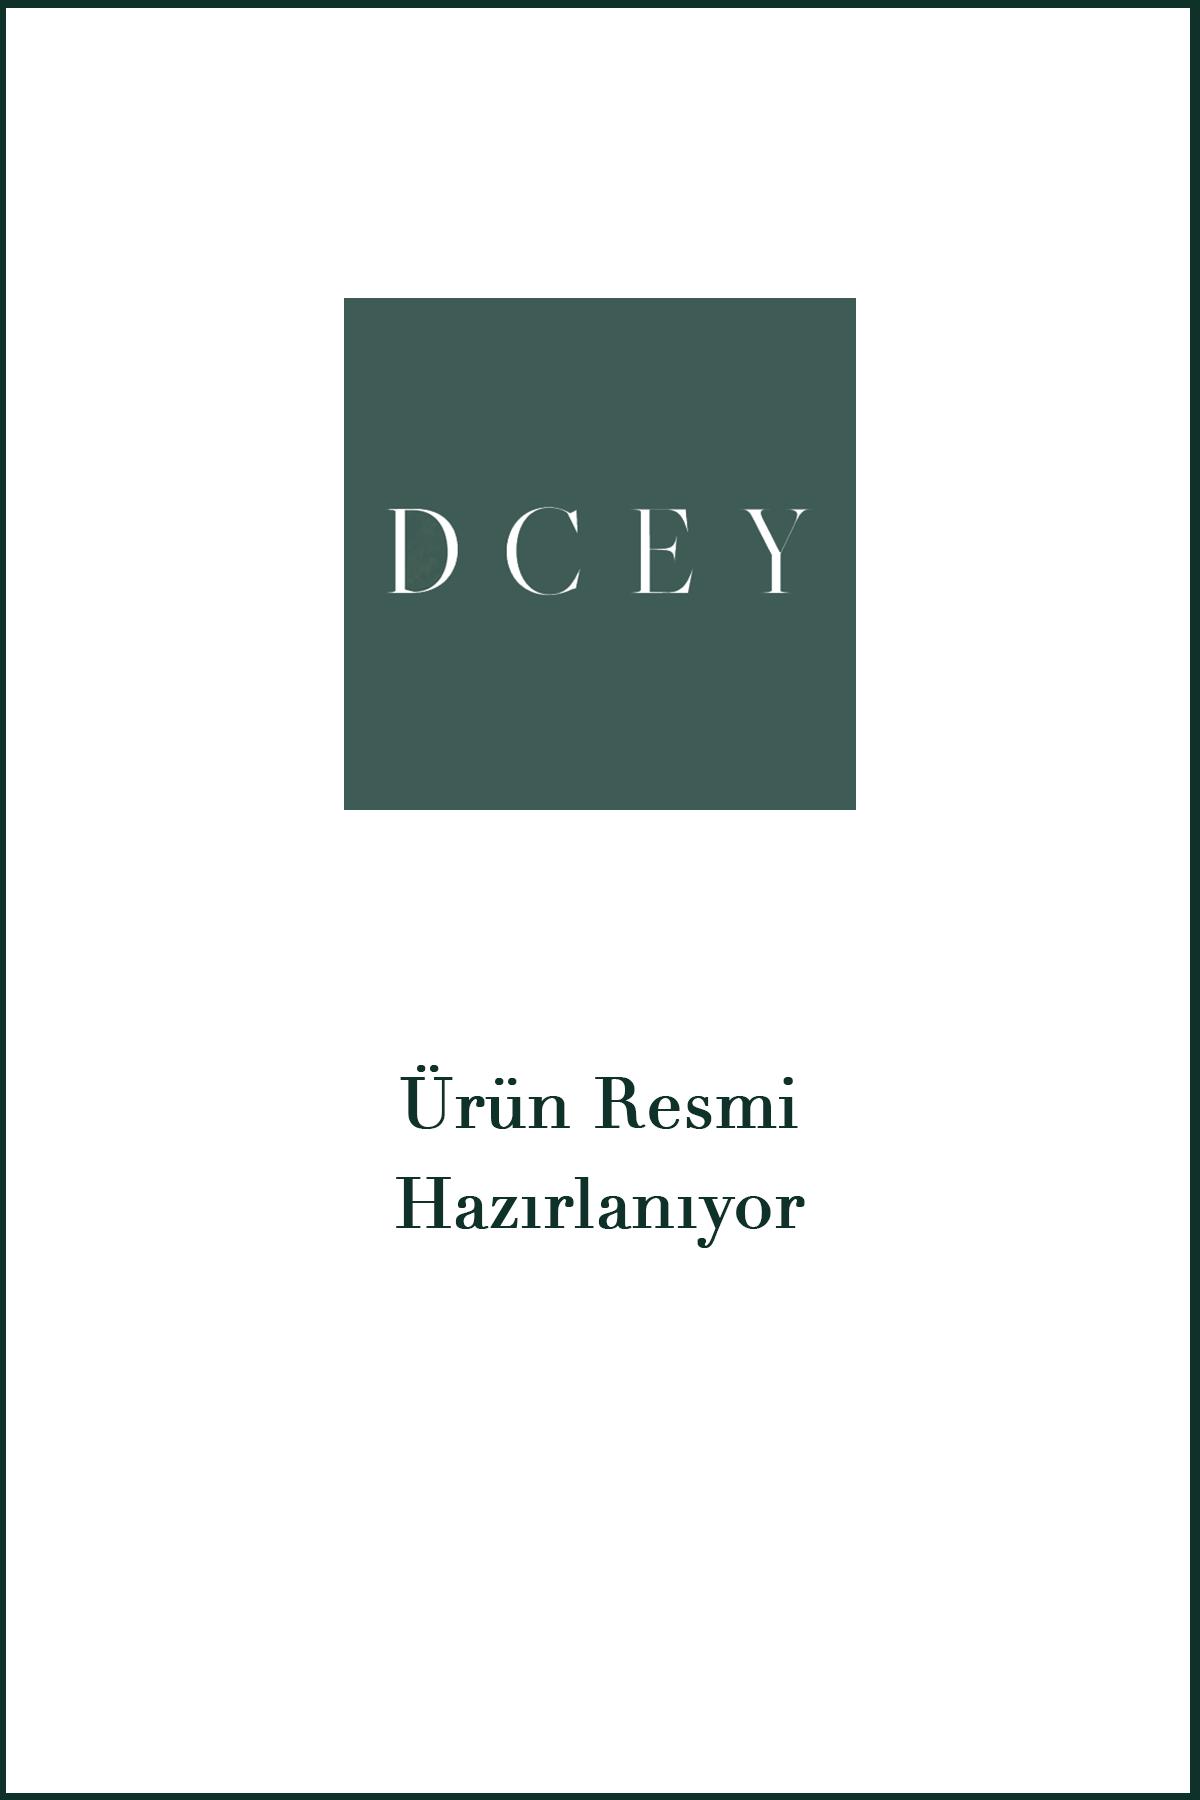 Carol Palm Kimono